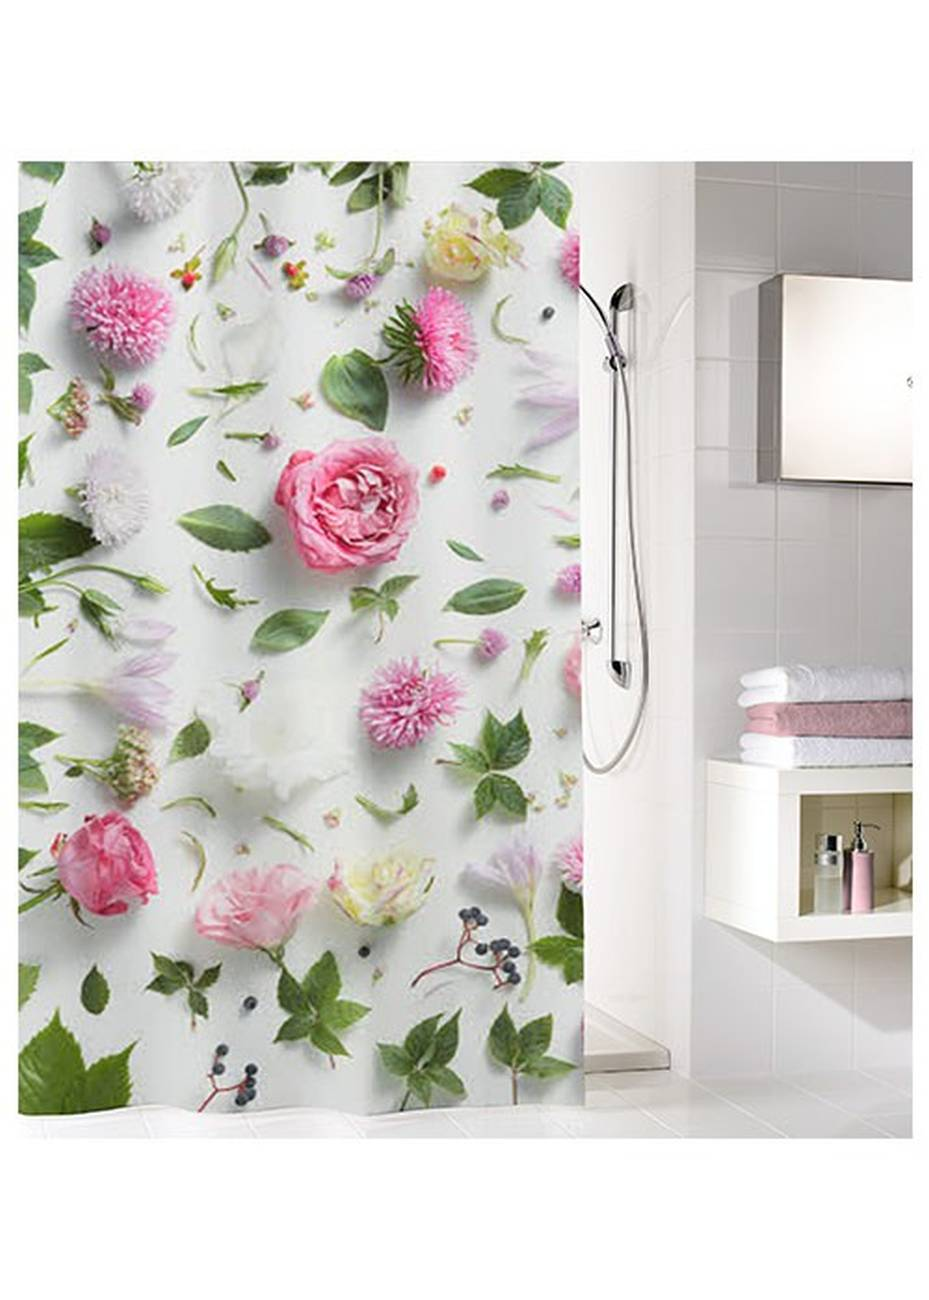 Duschvorhang Rosalie 100 % Polyester Multicolor 240x180 cm